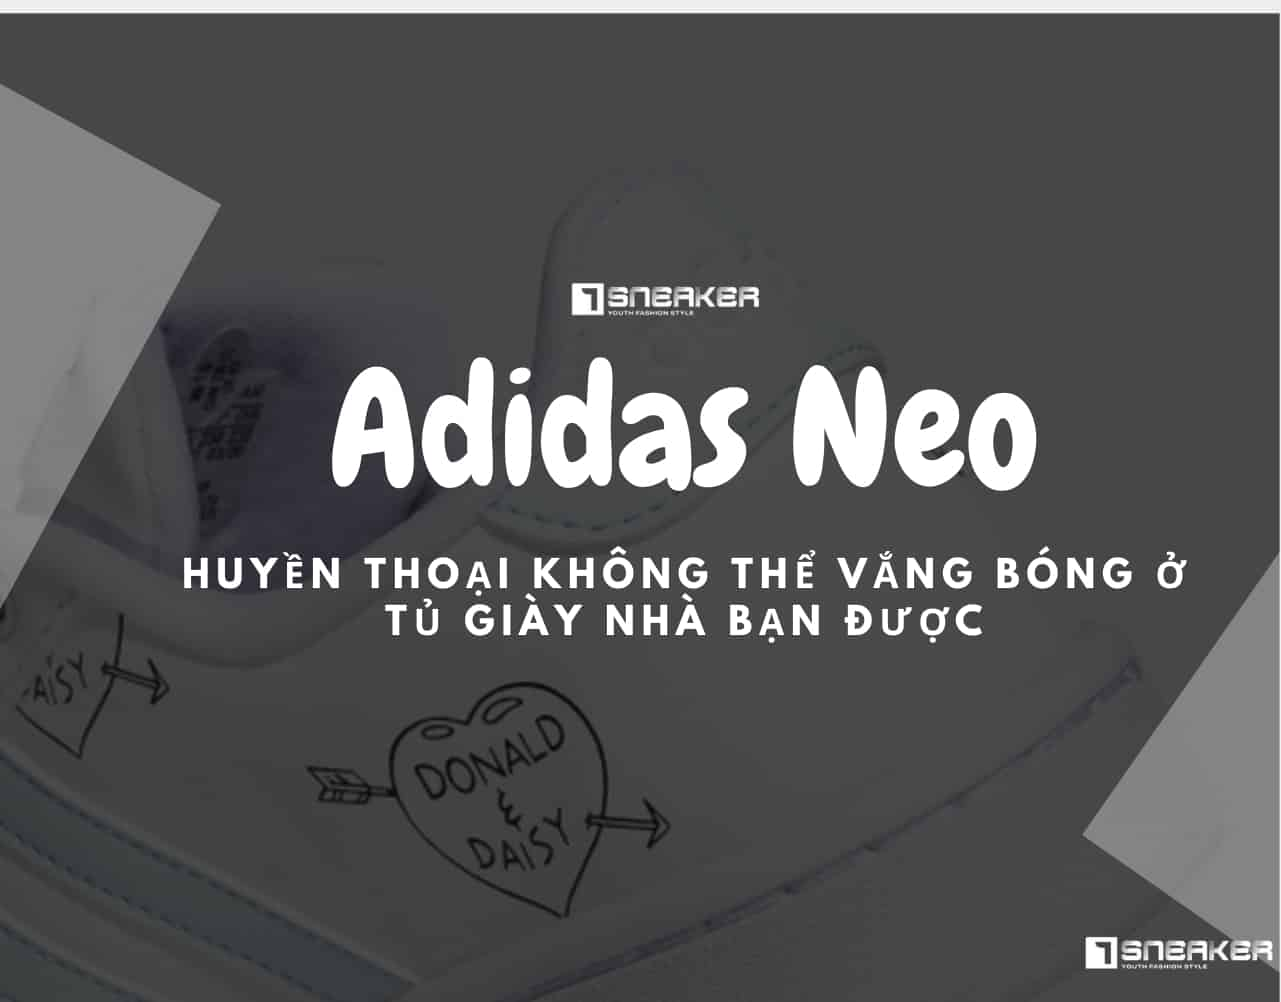 Adidas Neo nam nu thinh hanh tai Viet Nam va thi truong quoc te